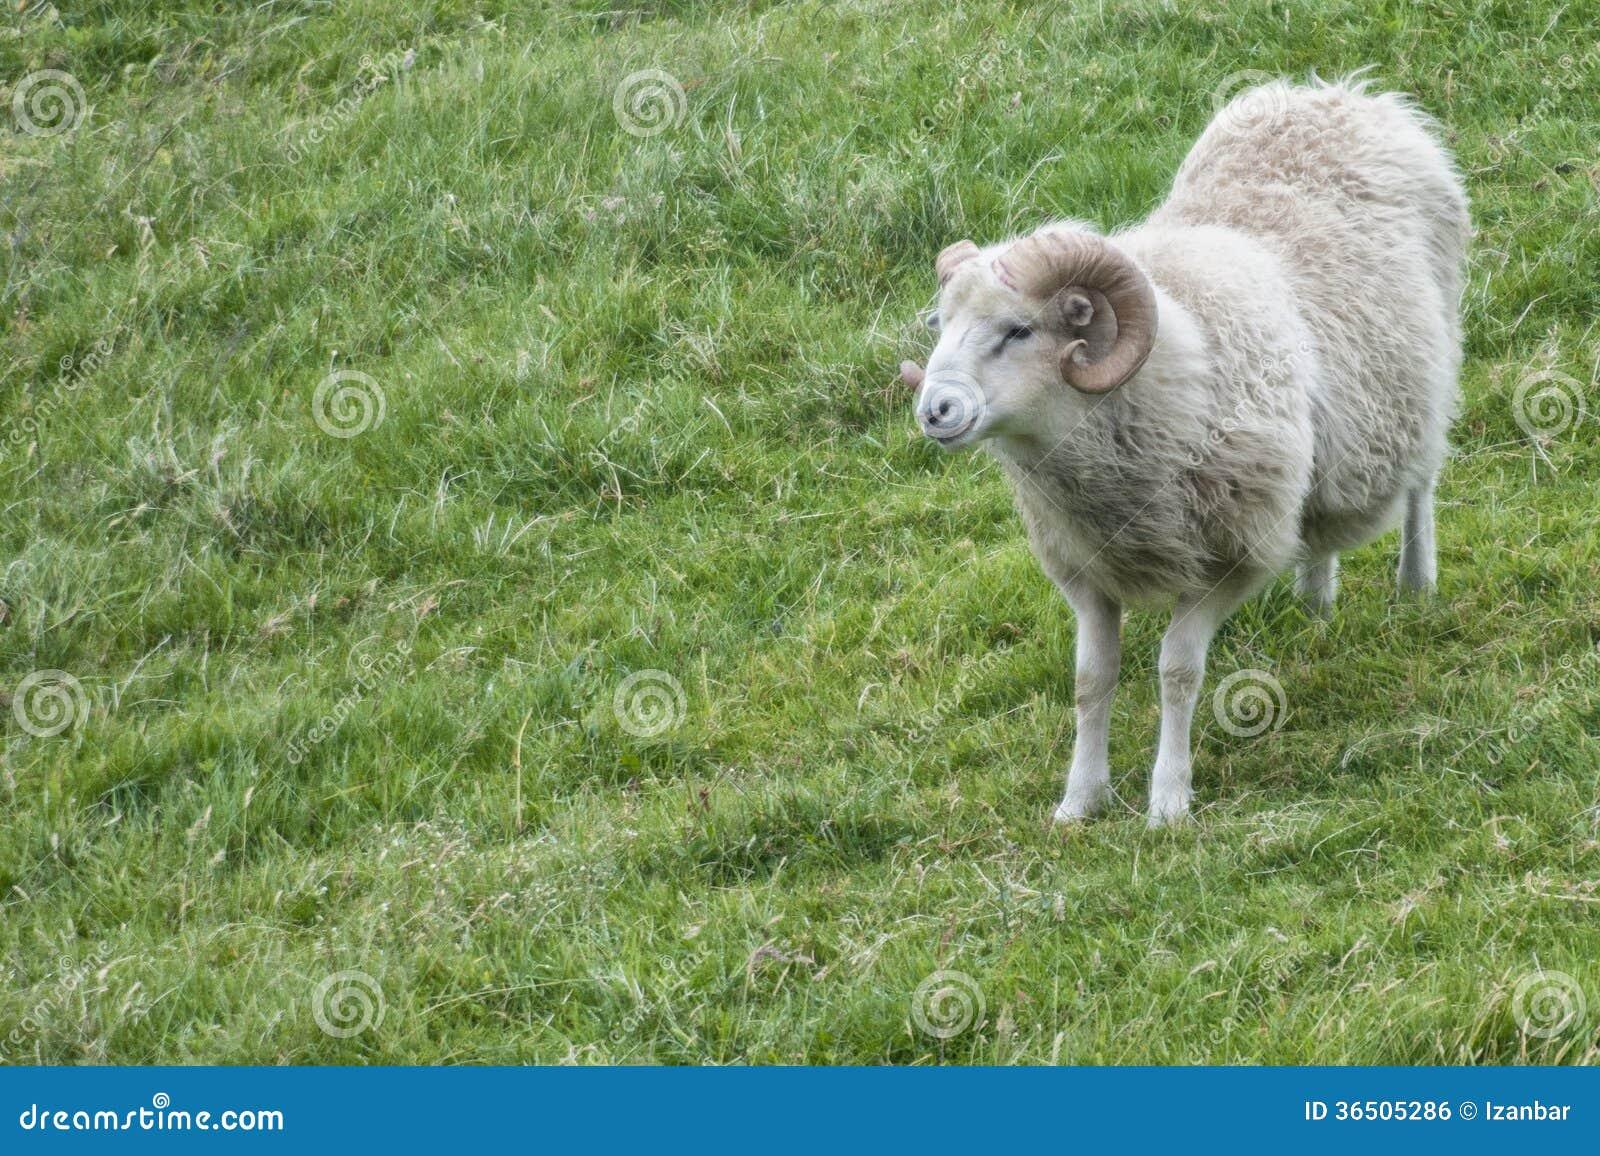 One sheep white background